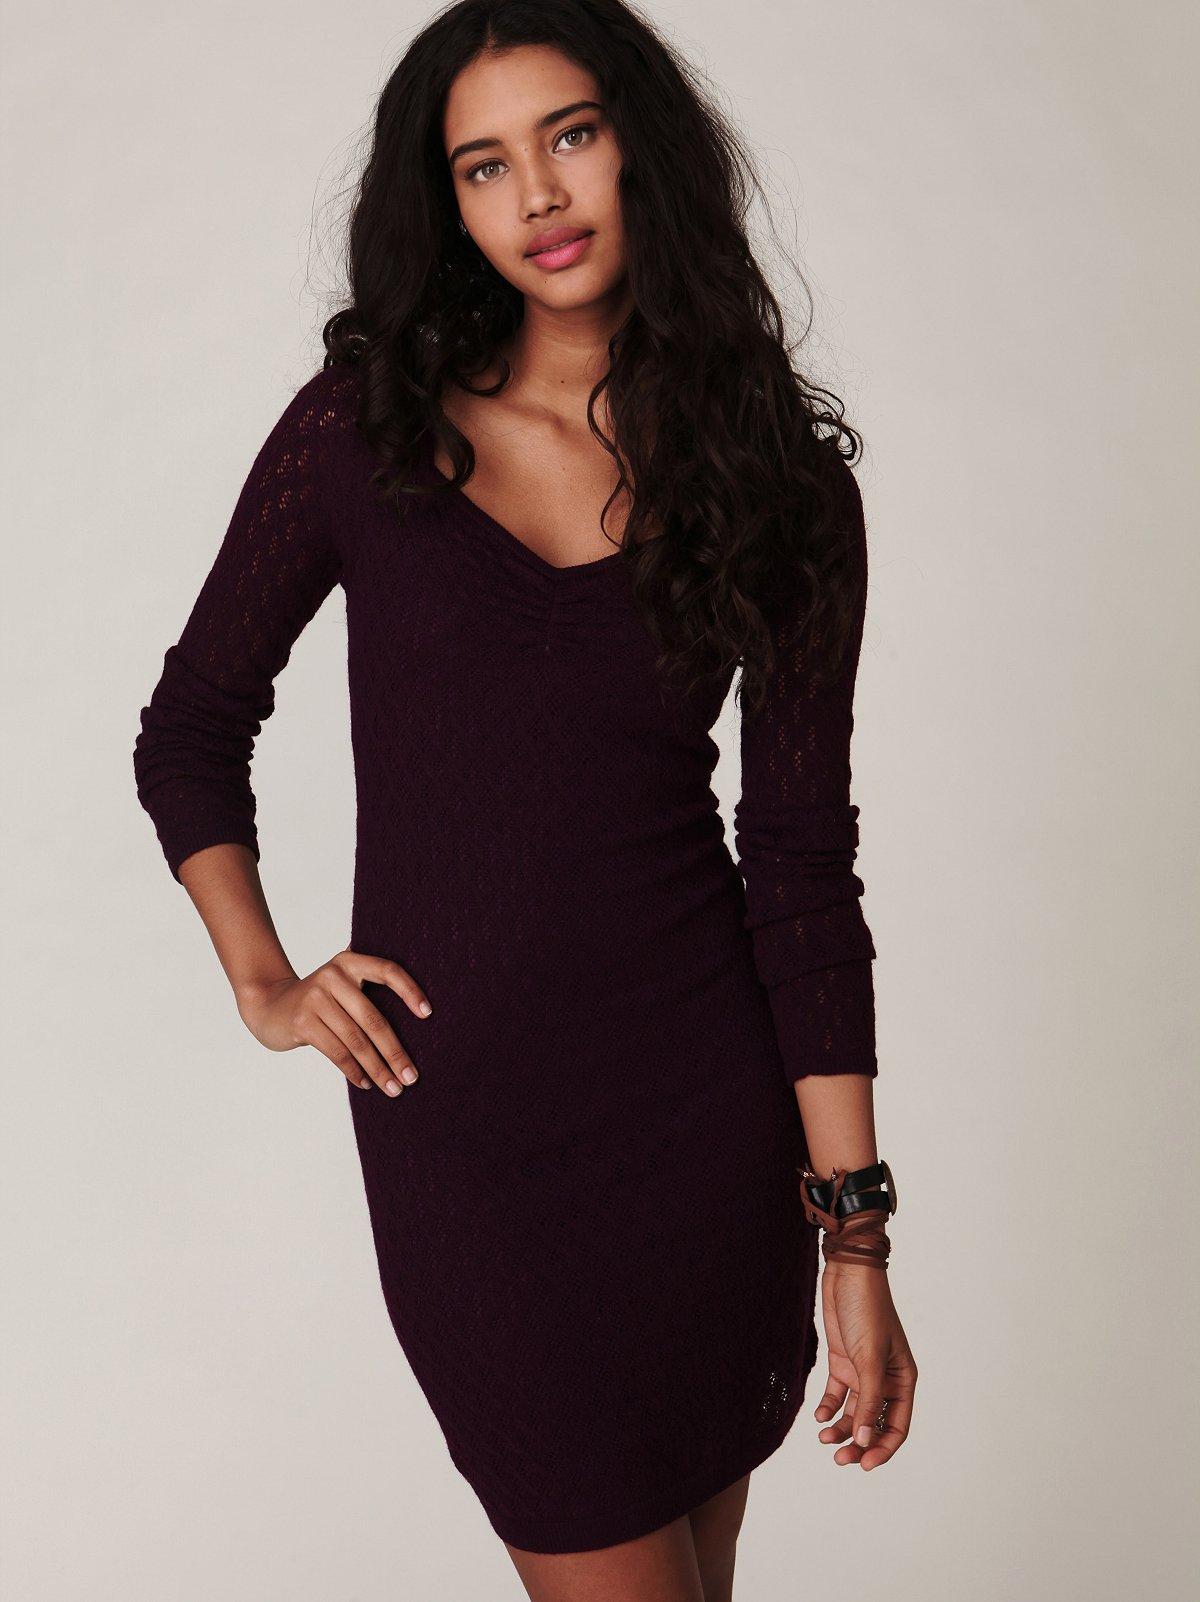 Sweater Bodycon Dress